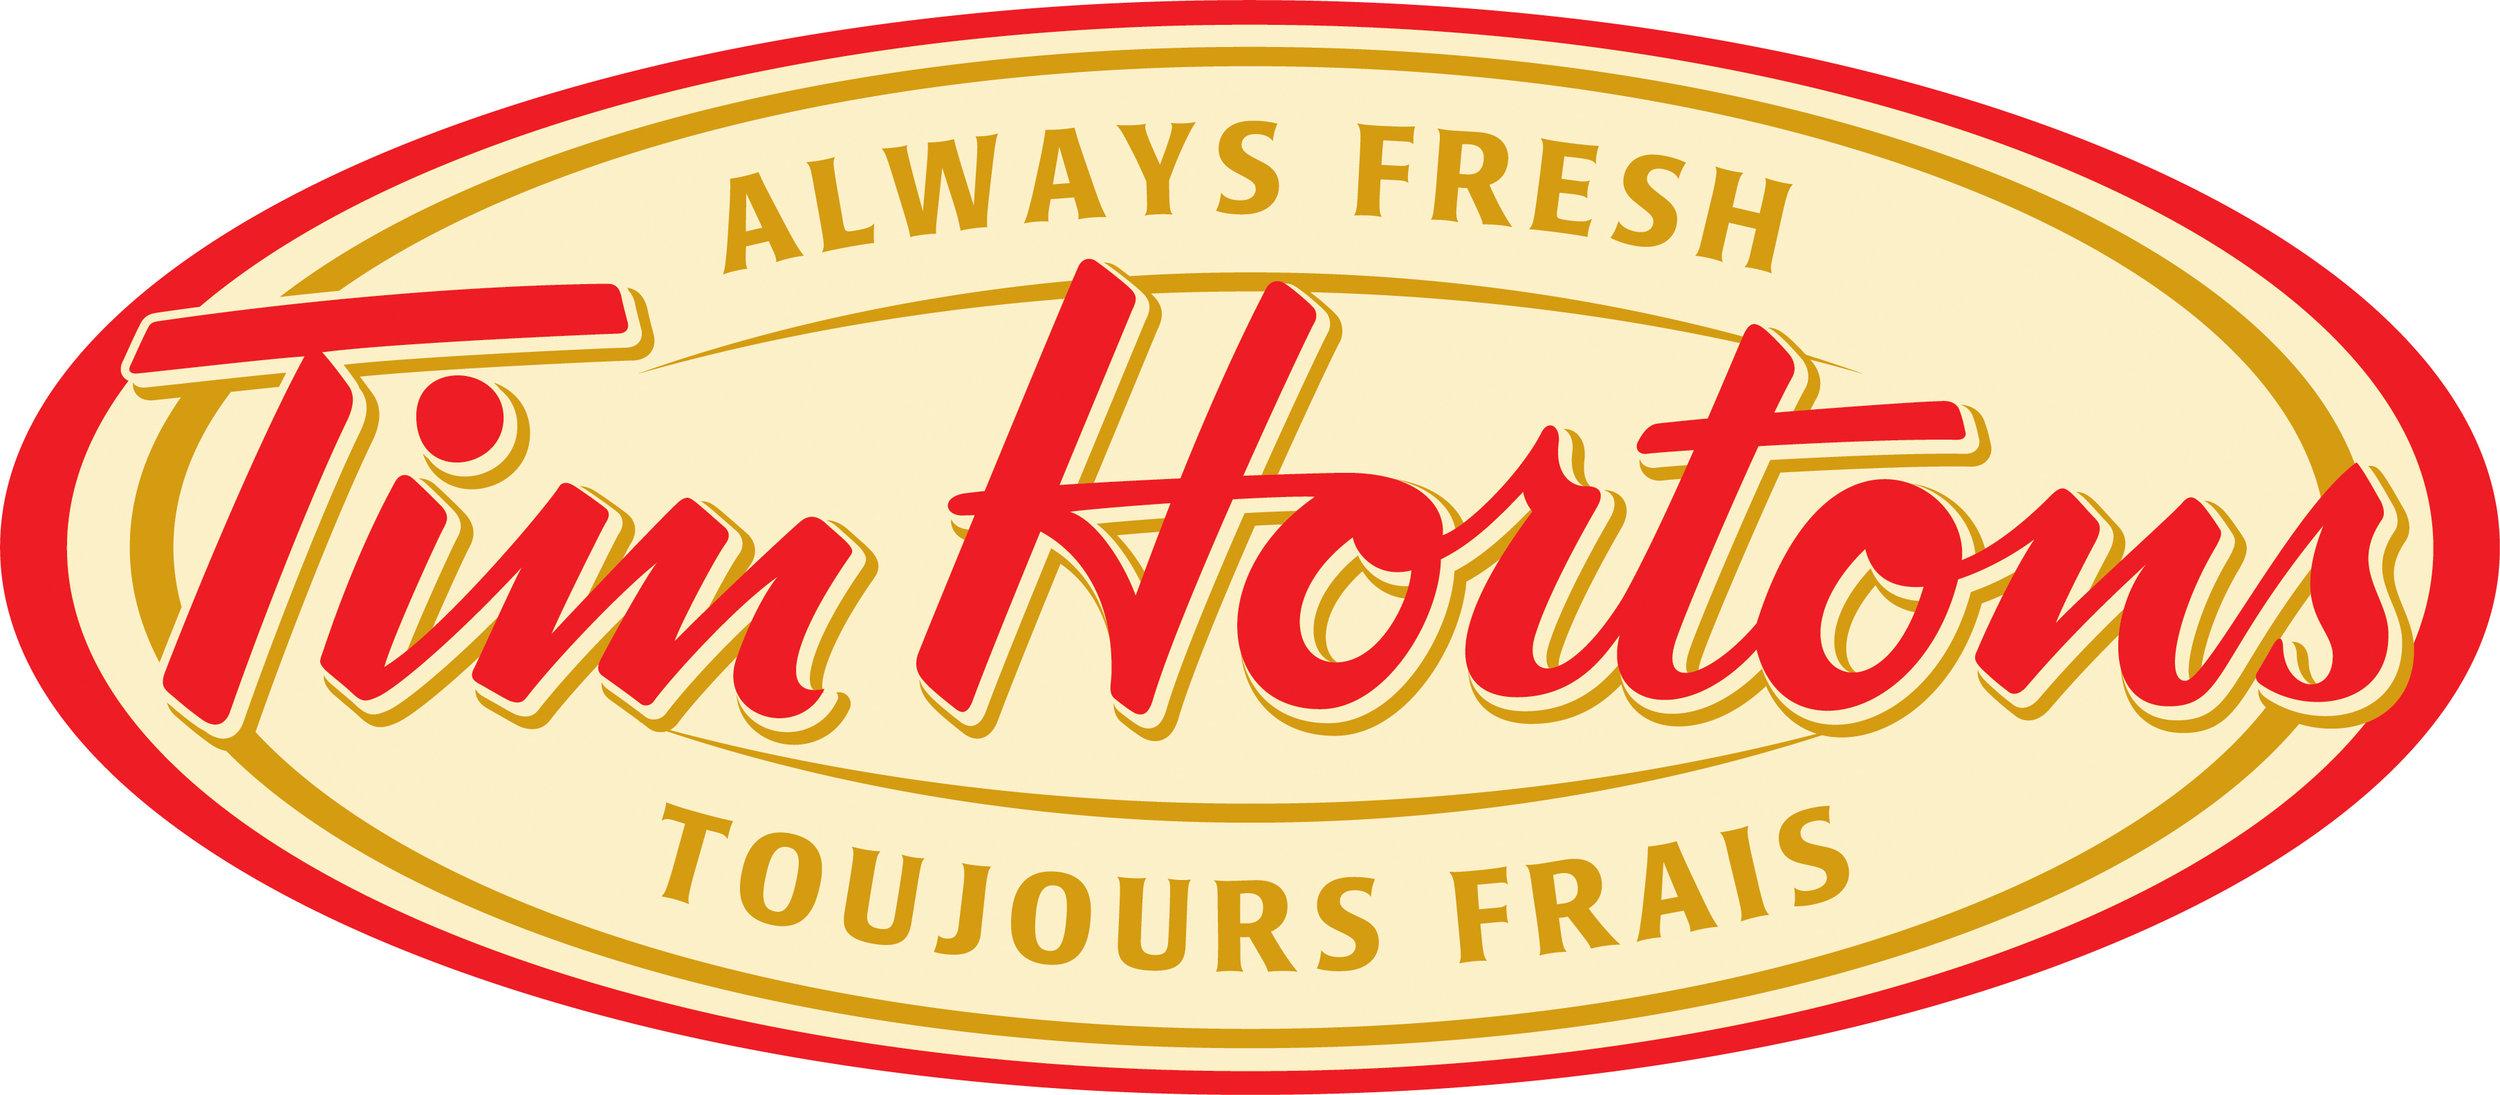 Tim_Hortons_Always_Fresh_Bilingual.jpg